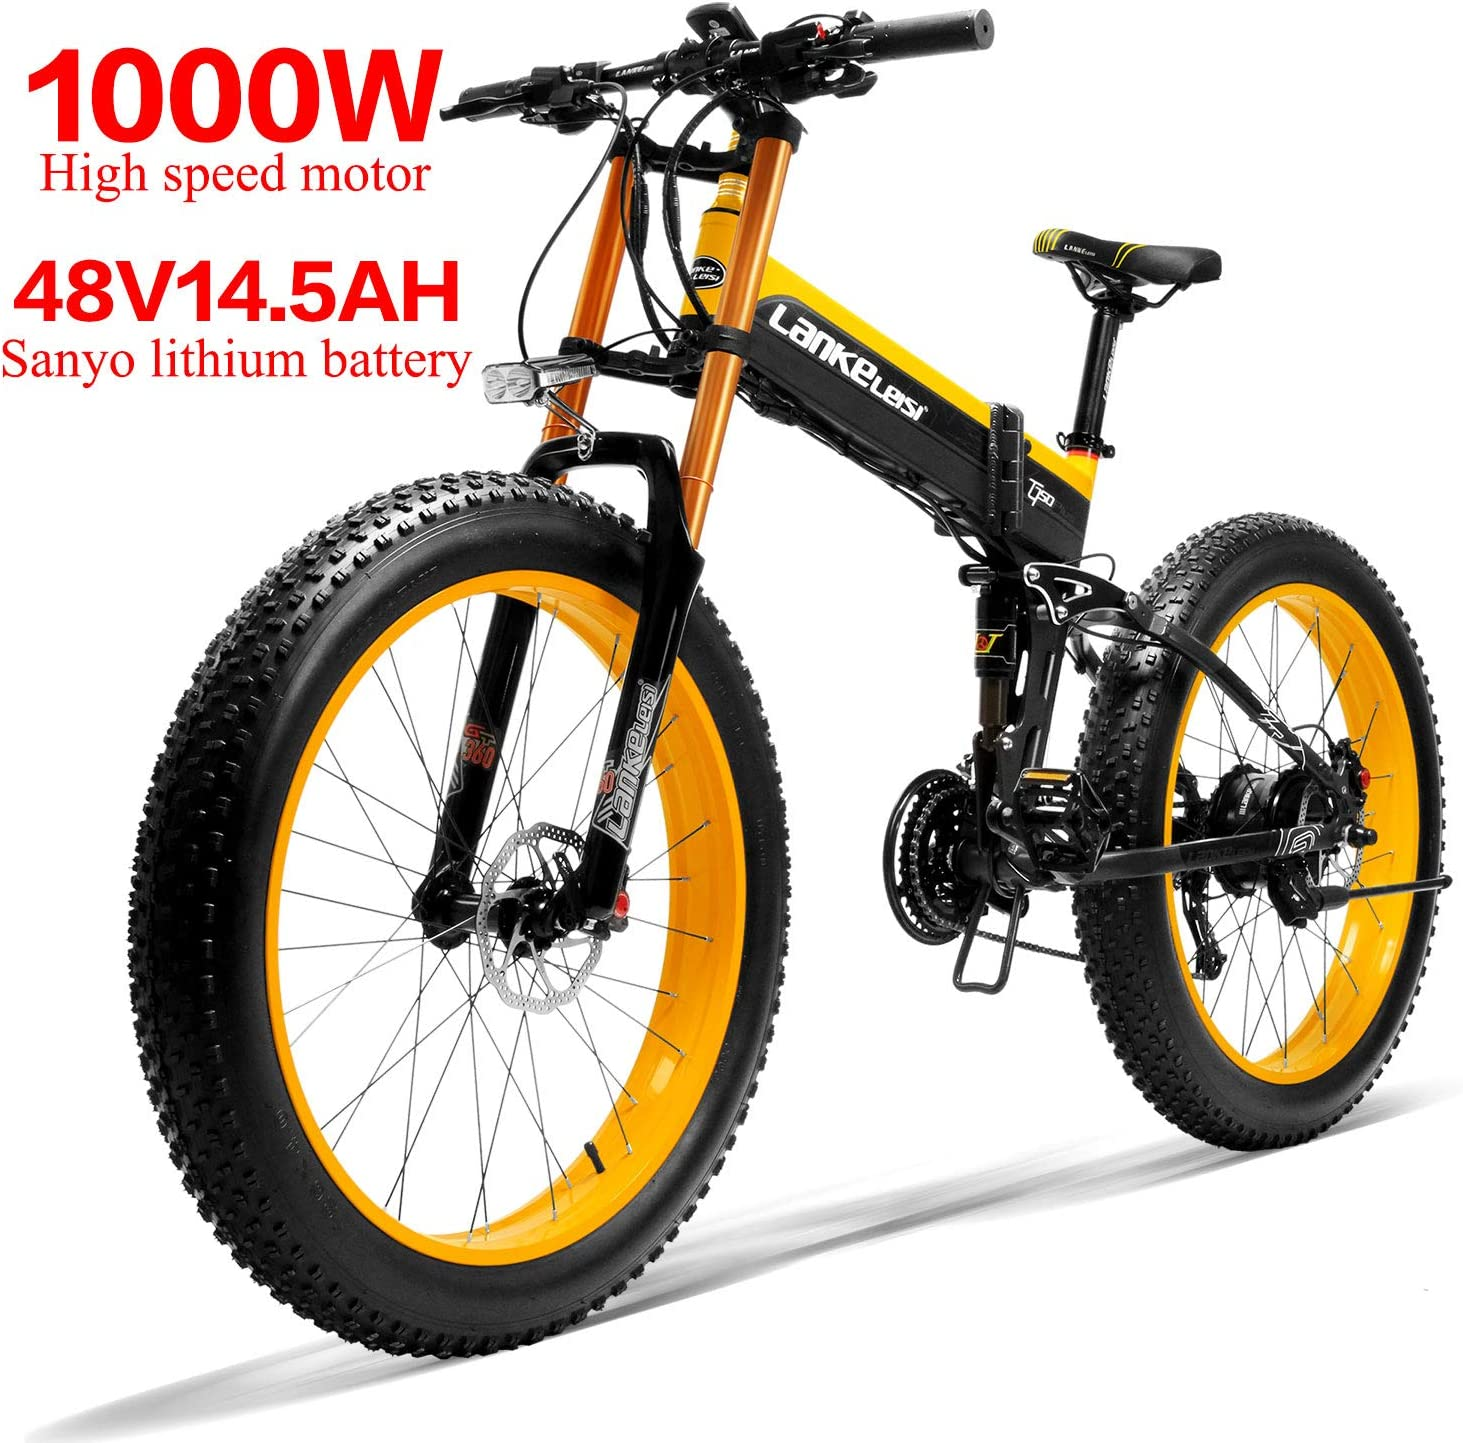 LANKELEISI 750PLUS 48V14.5AH 1000W Motor Bicicleta eléctrica con ...